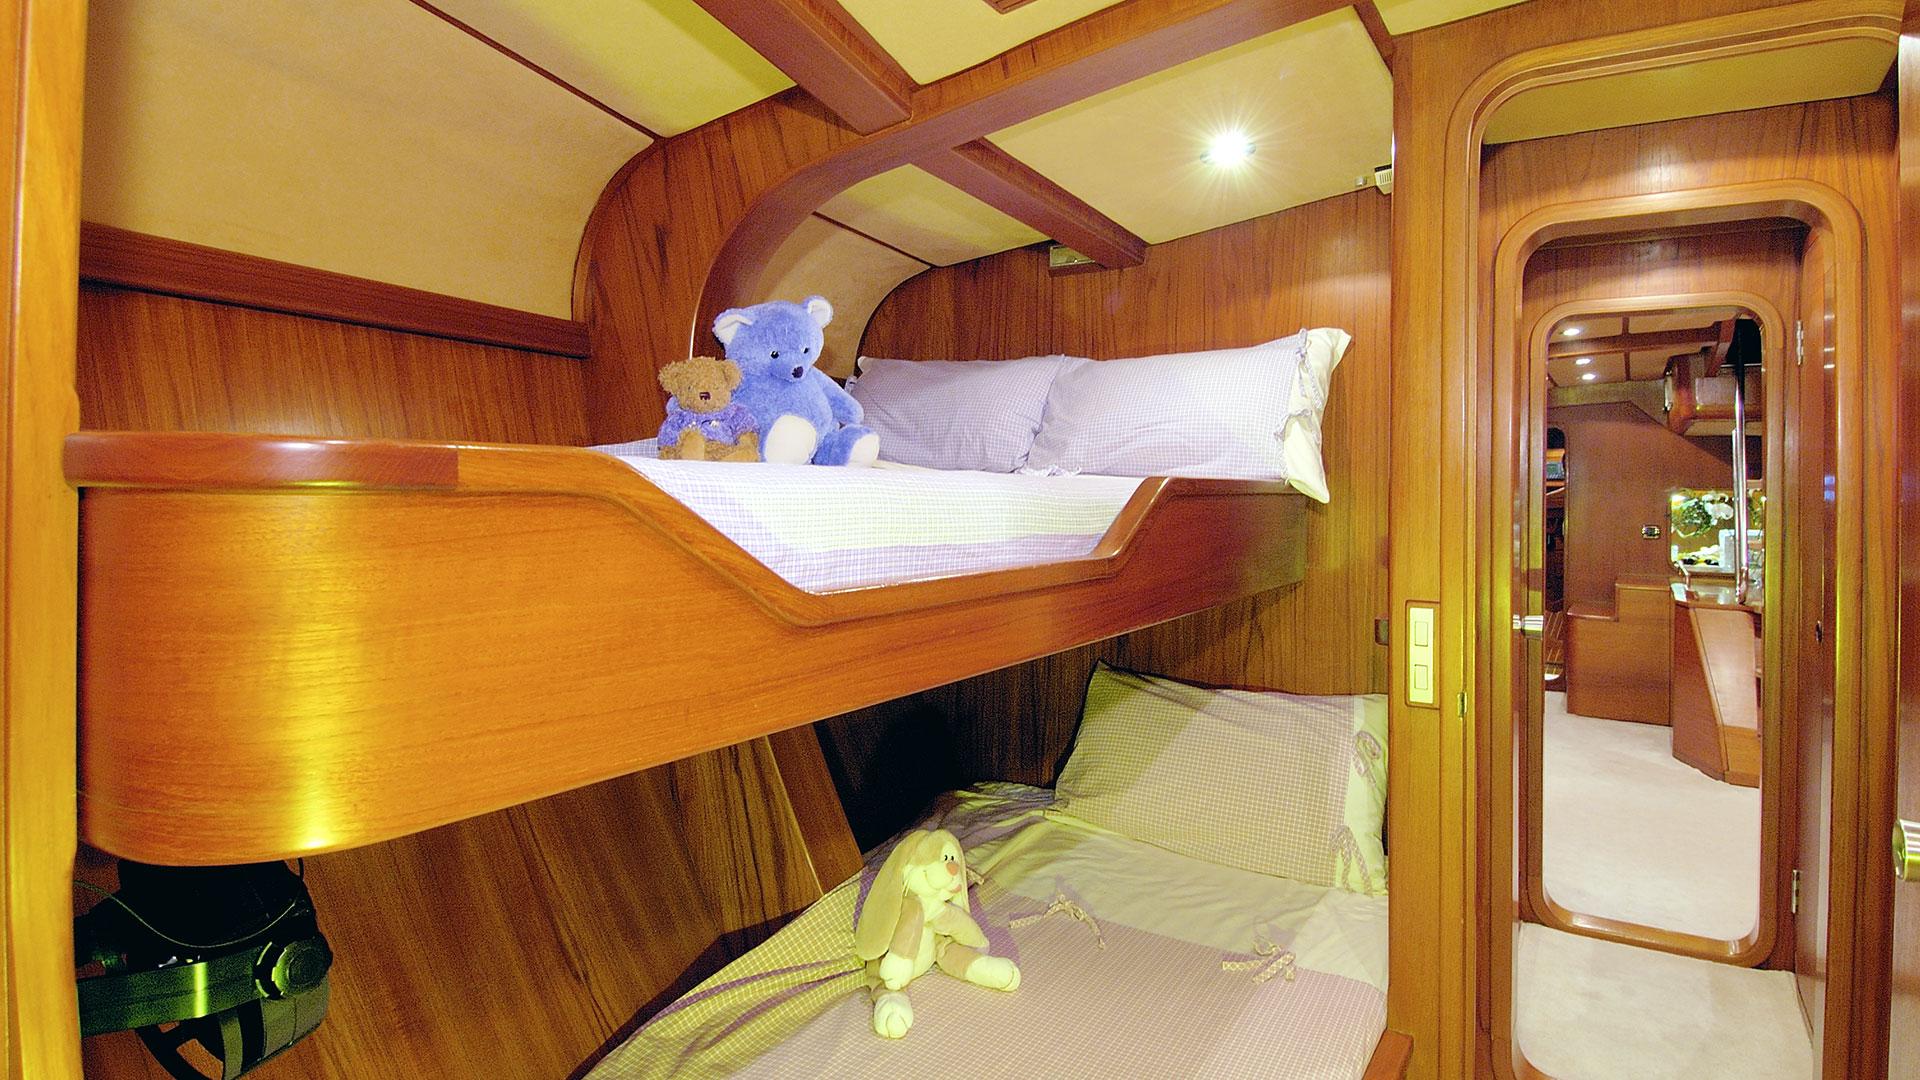 Luxury superyacht keyla interior by hot lab luxury yacht charter - Baltic Yacht Midnight Sun Of London Forward Bunk Cabin